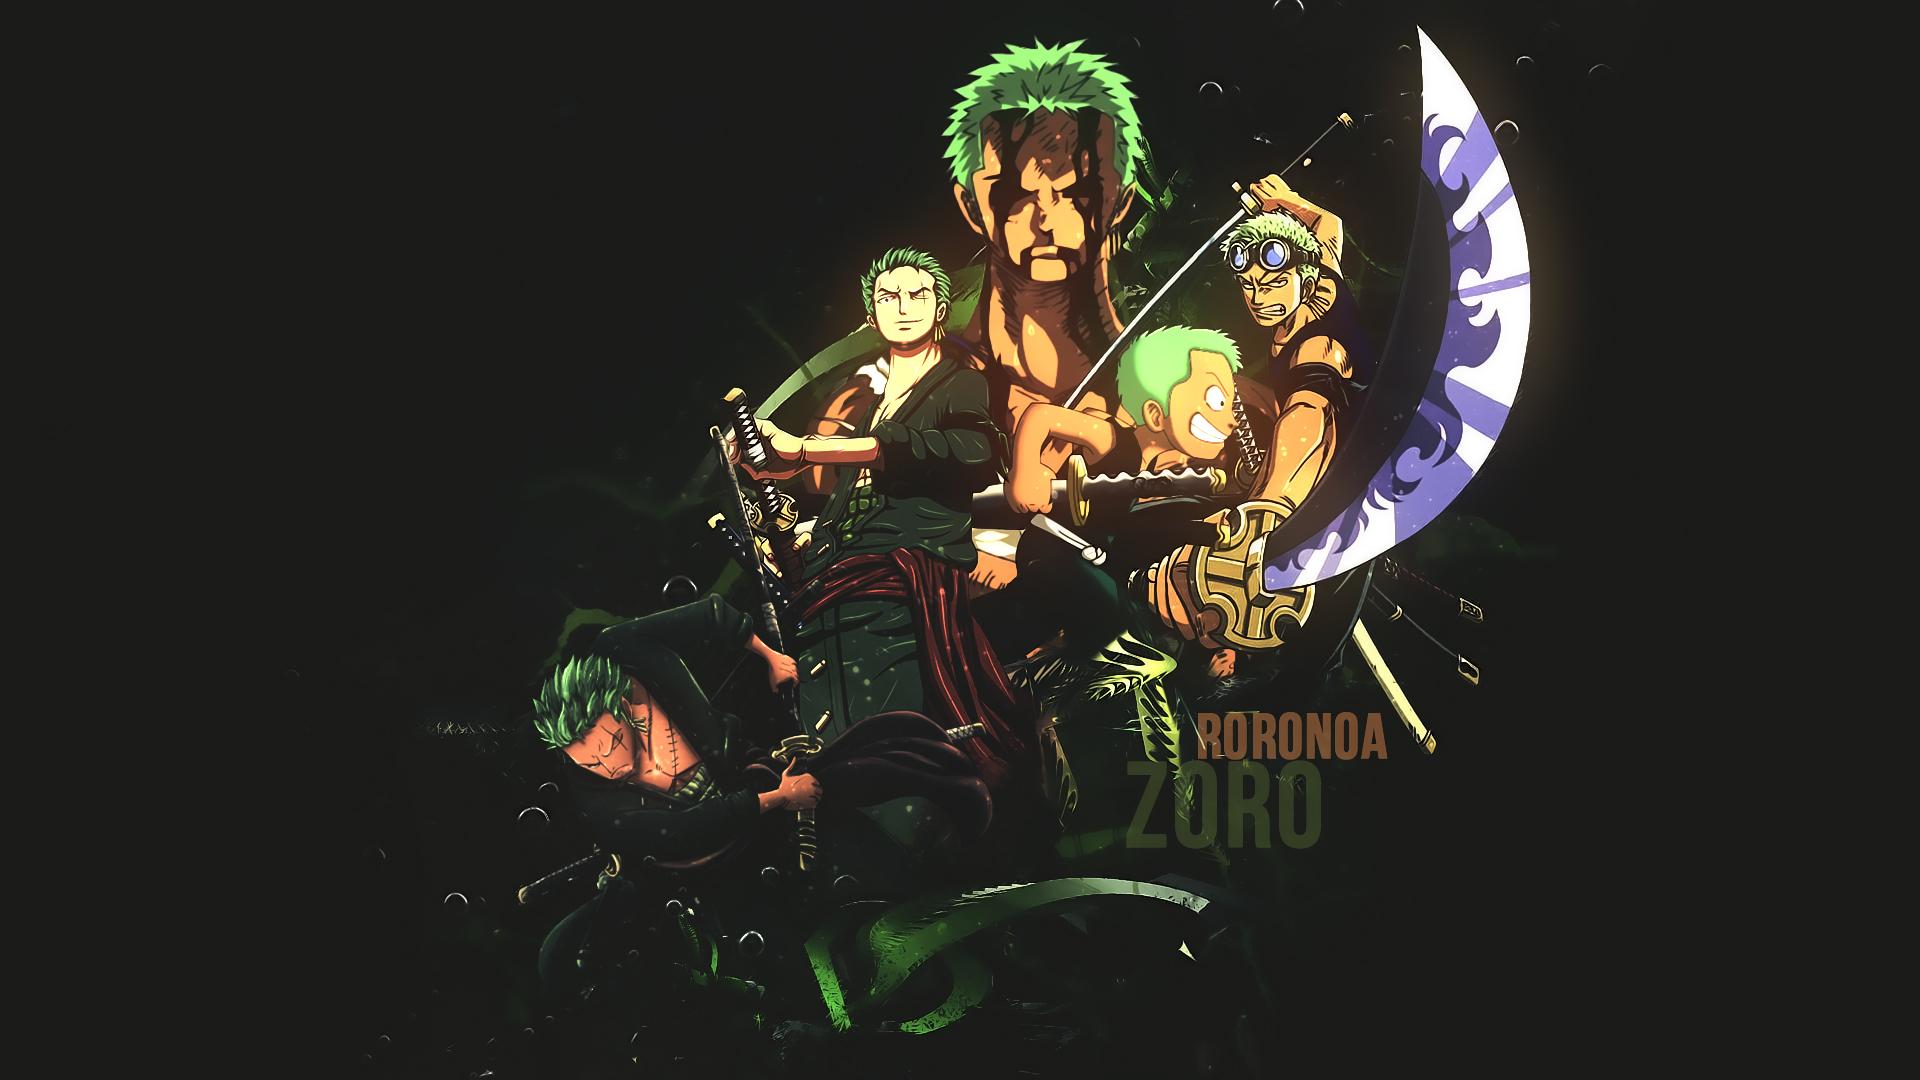 roronoa zoro wallpaper by dani17k on deviantart